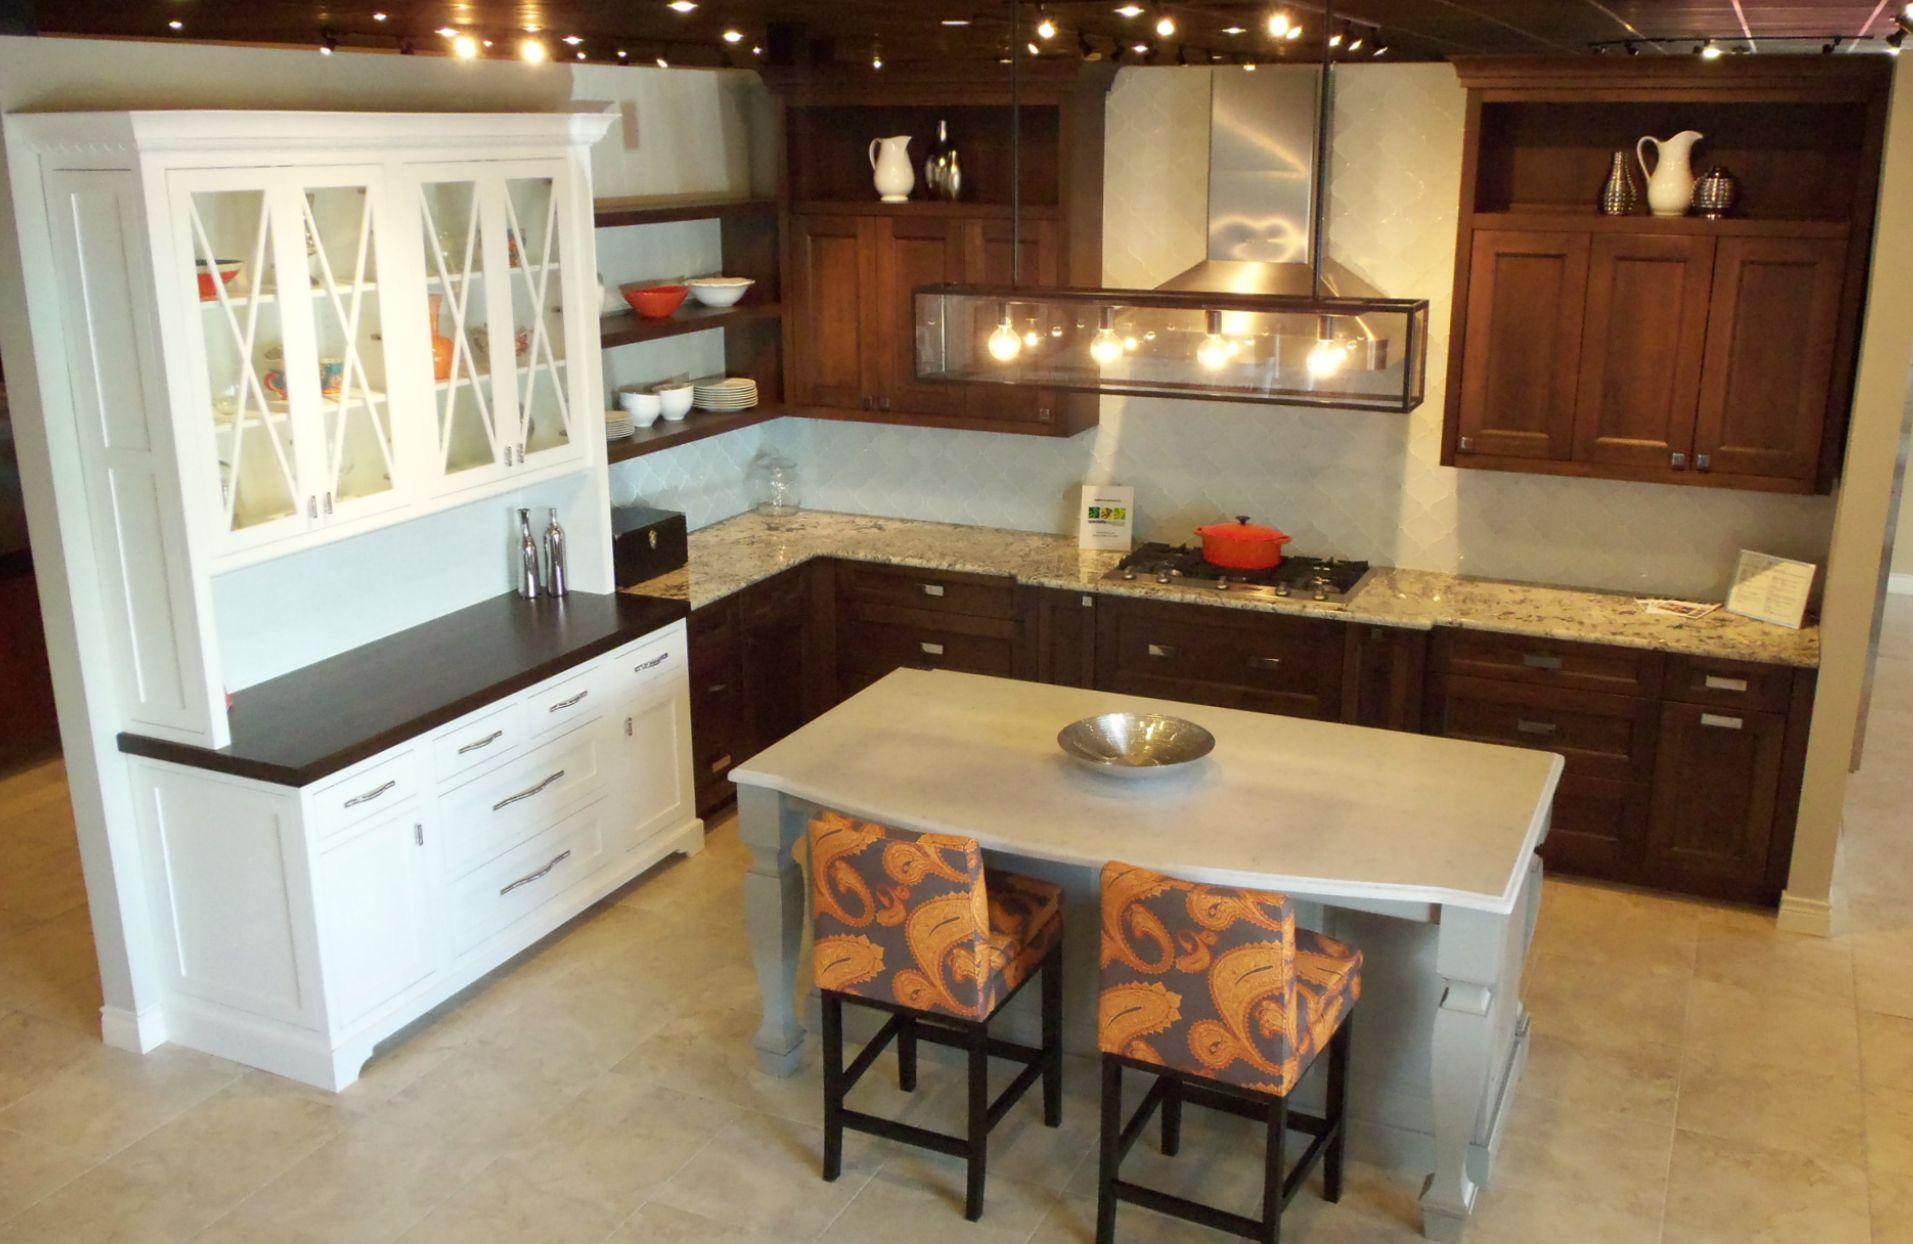 bkc kitchen and bath | bkc showroom update